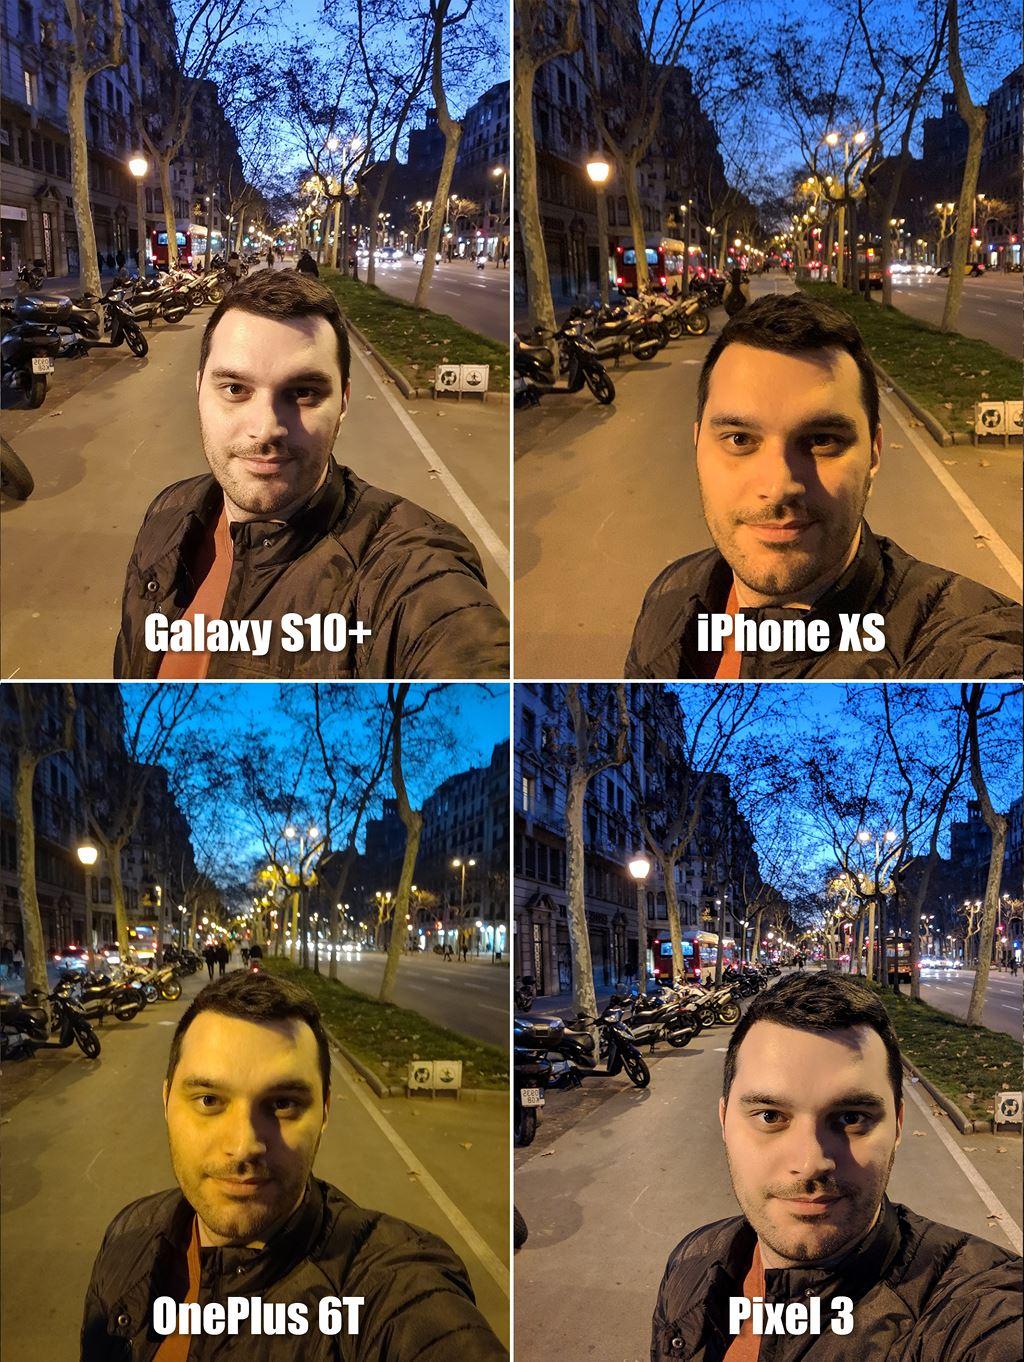 So ảnh selfie của Galaxy S10+, iPhone XS, Pixel 3 và OnePlus 6T ảnh 7